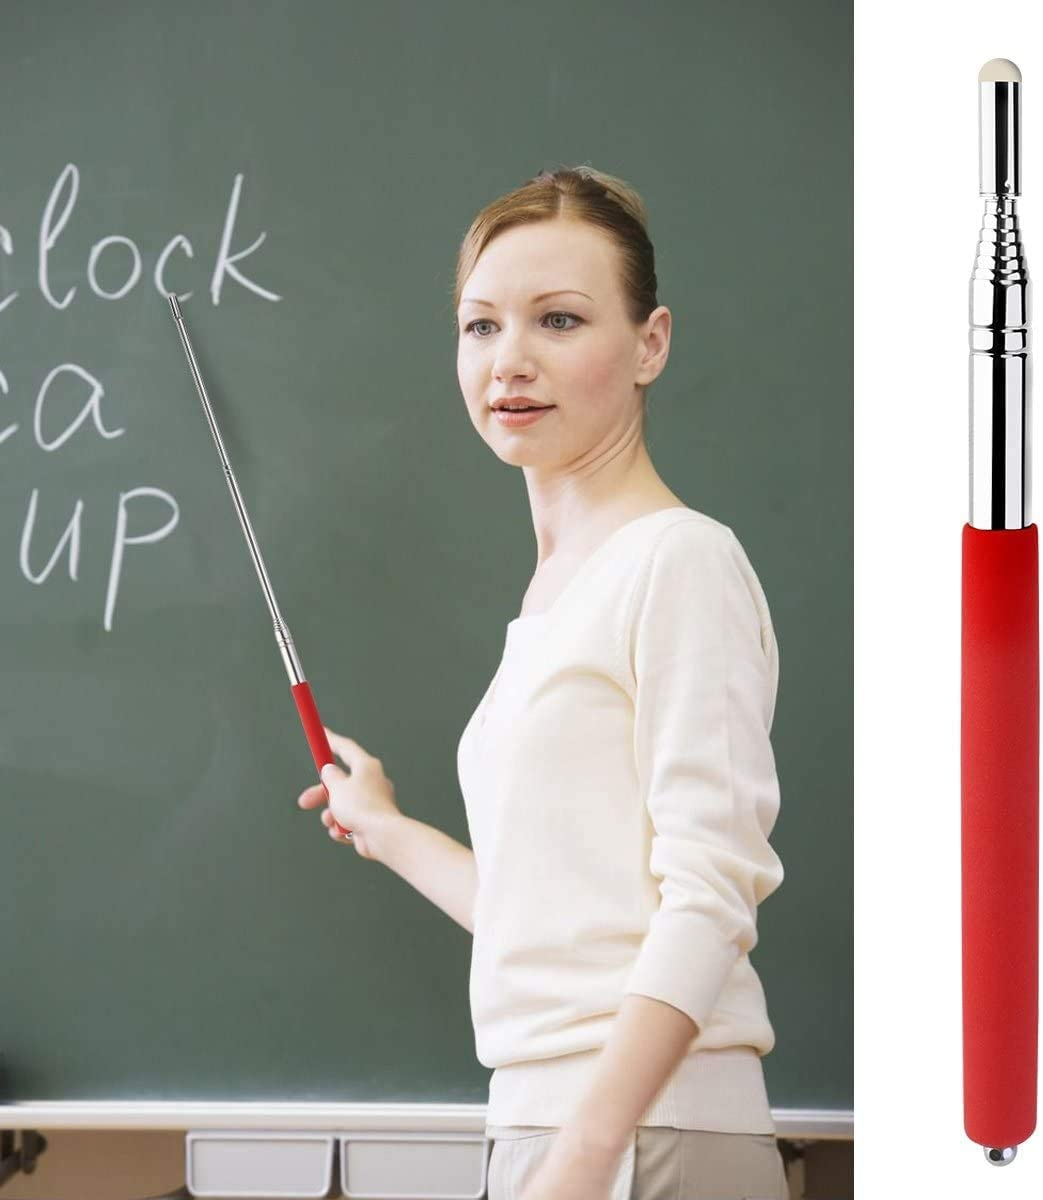 Extendable Whiteboard Pointer Stick Black 1m//3.3ft Meeting Handheld Flag Pole with Clips Portable Tour Flagpoles Presenter Retractable Teacher Stick for Classroom Telescopic Teachers Pointer